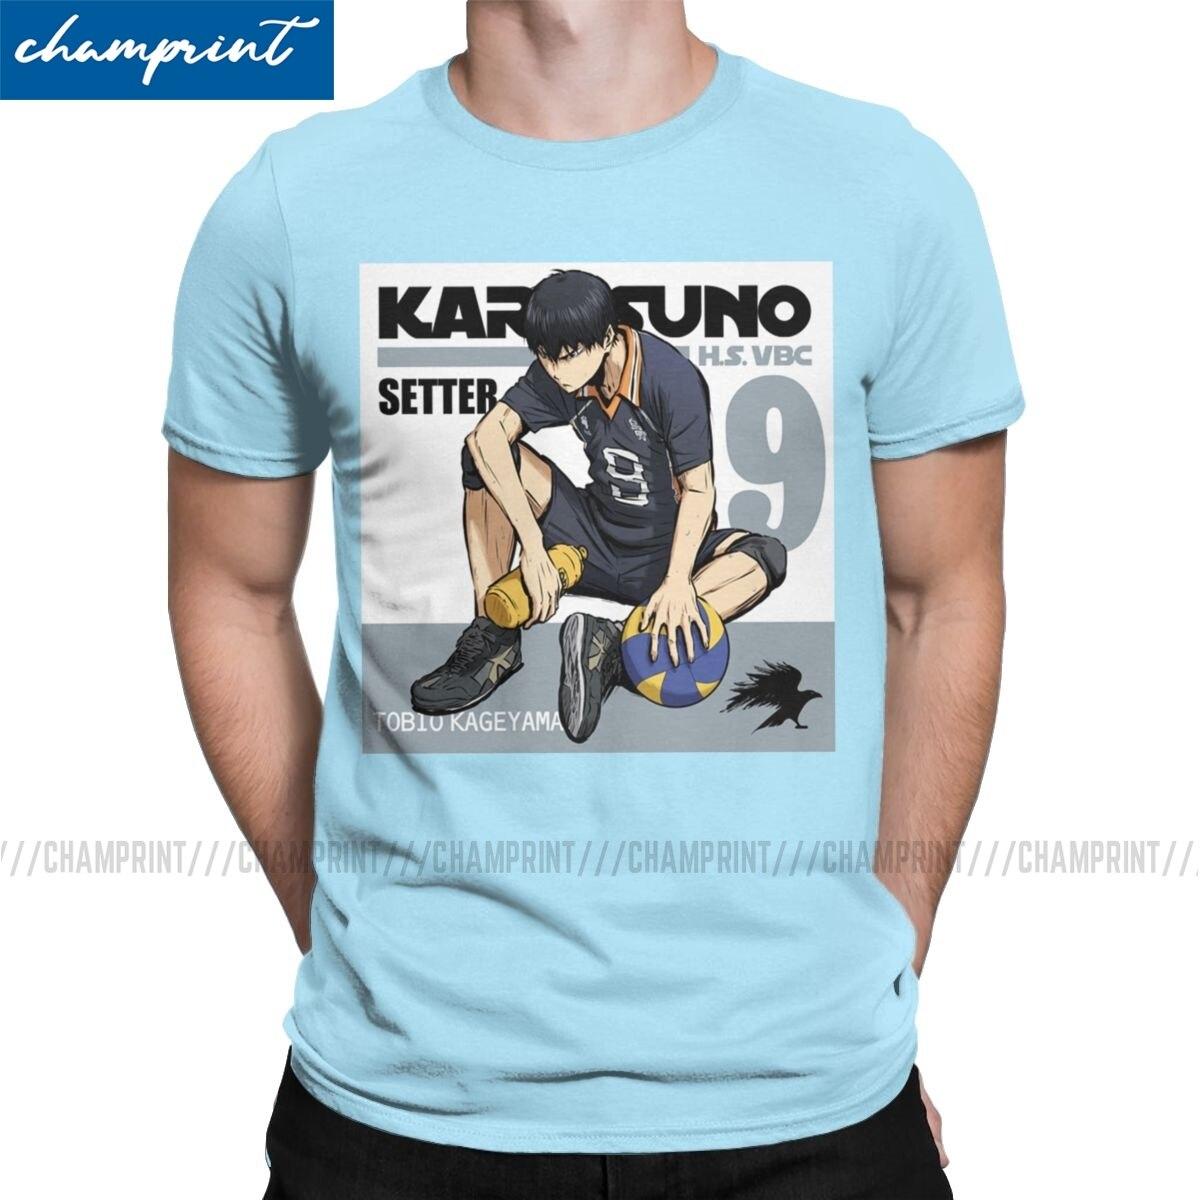 Camiseta haikyu-tobio Kageyama para hombre, camisetas de Manga de voleibol, ropa única de Manga corta, Camiseta de cuello redondo, camisetas de talla grande